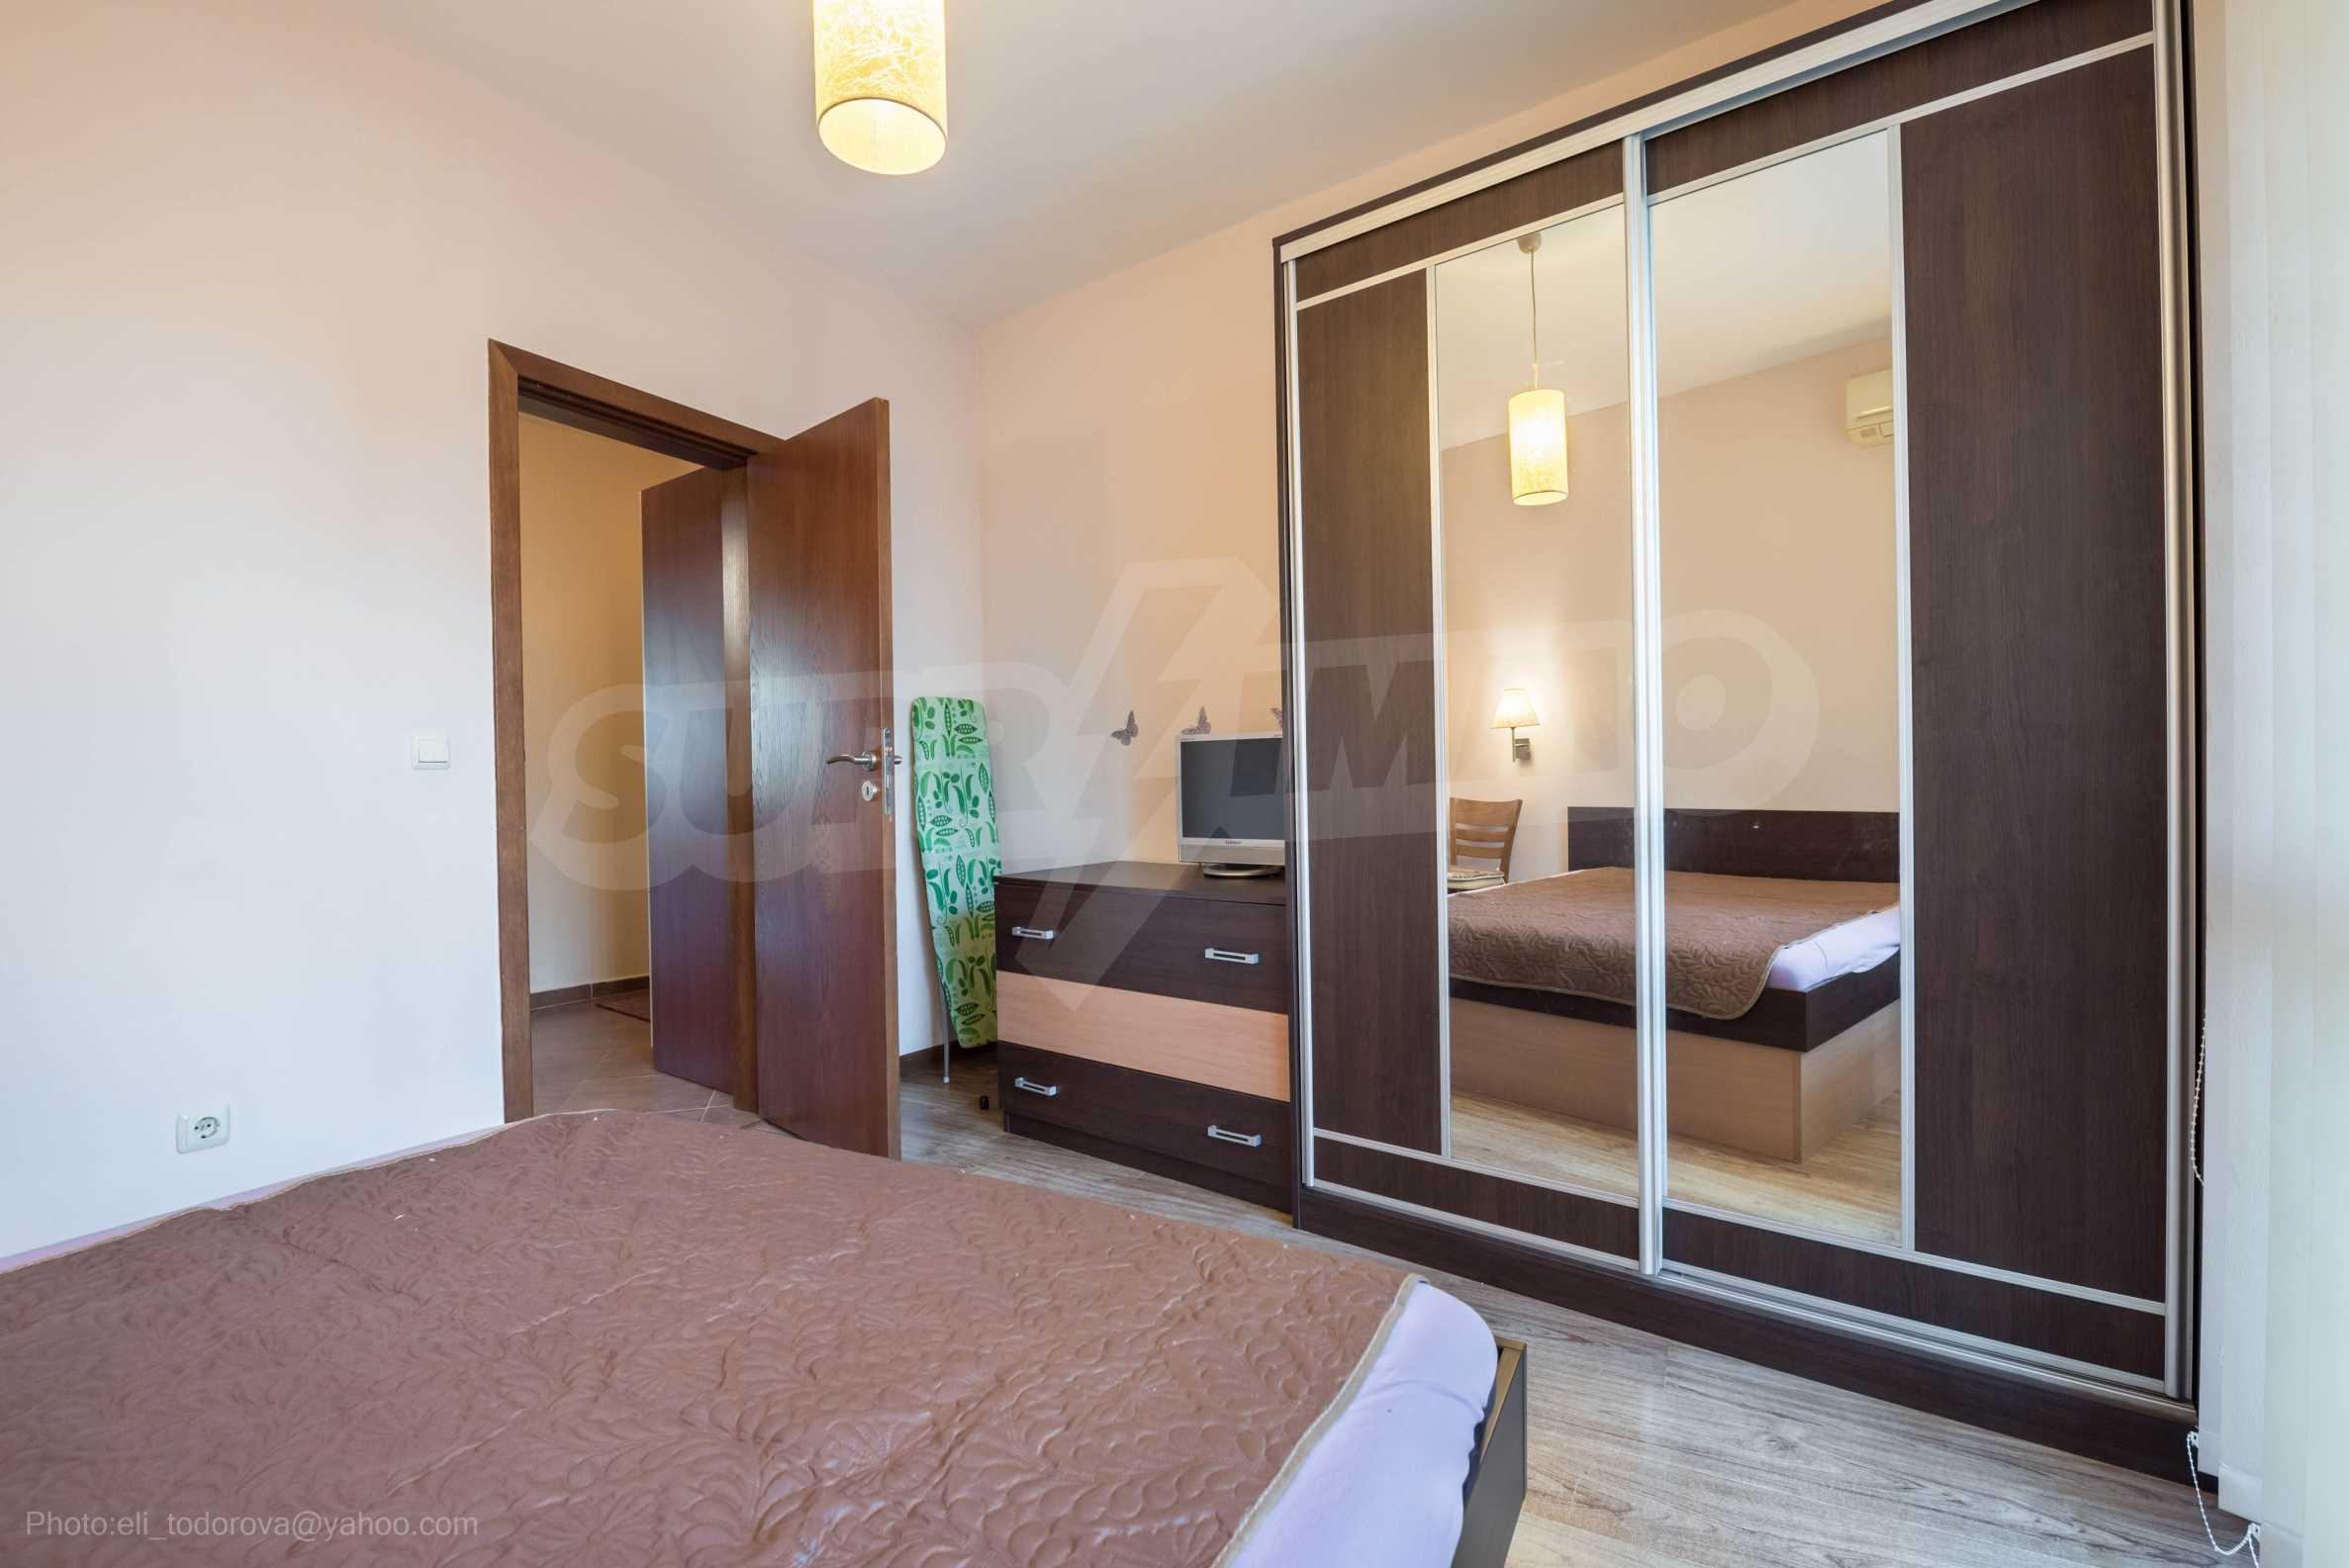 Квартира в аренду в Варне 12